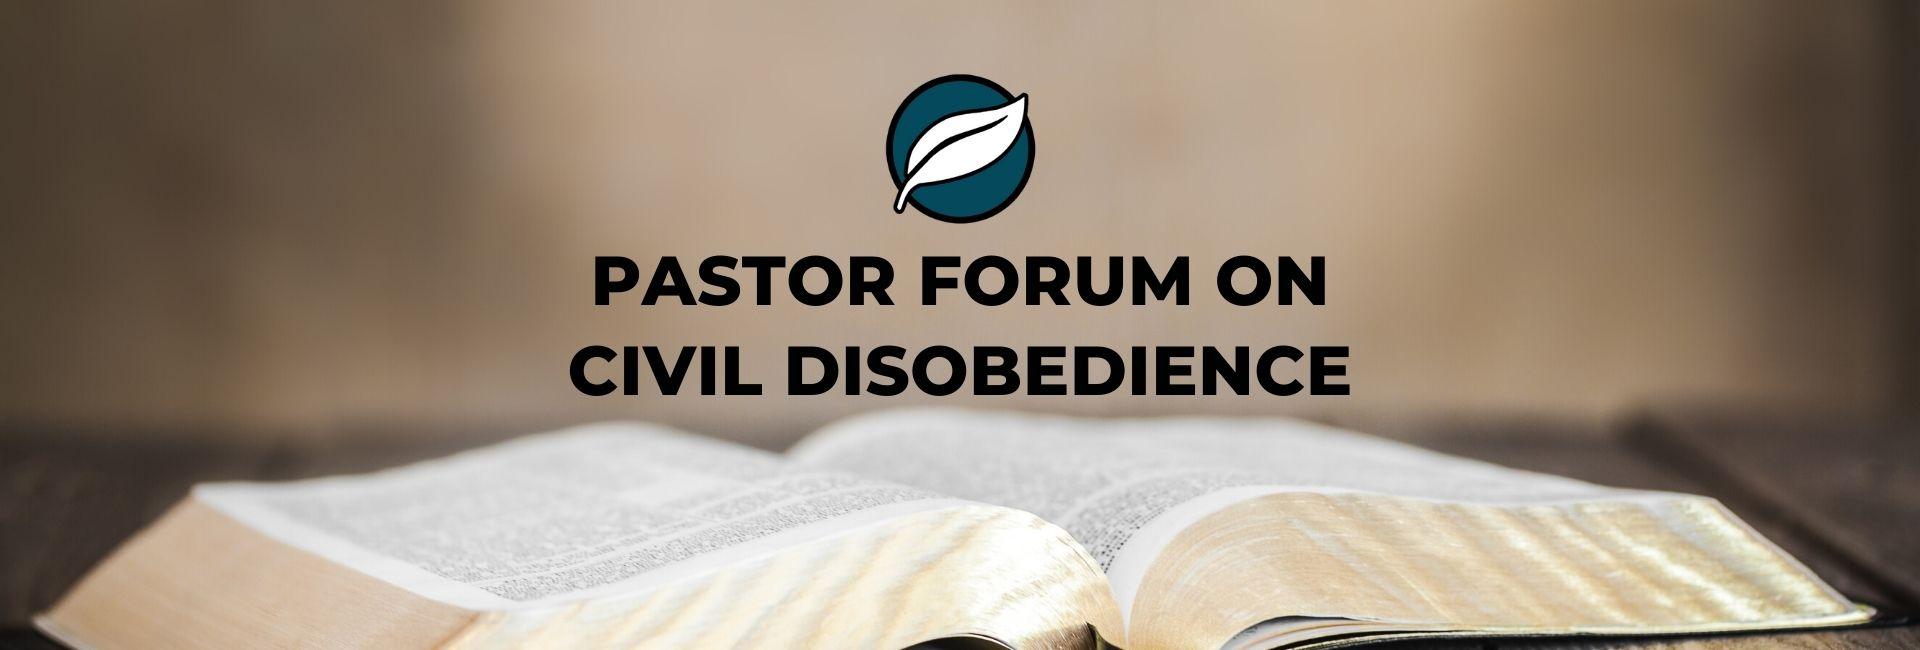 Pastor Forum 1 Web